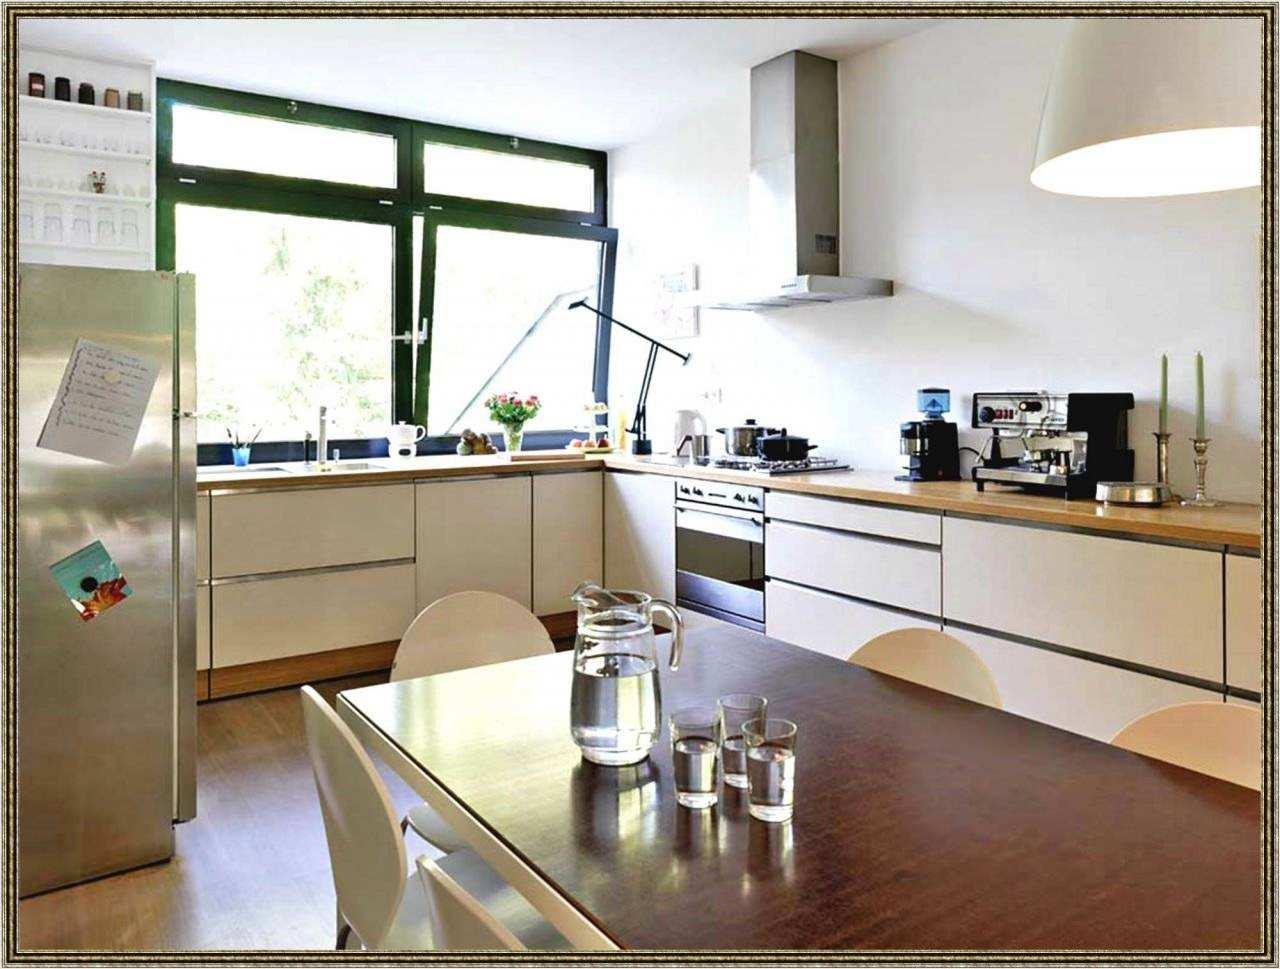 schone deko ideen neu gunstige wohnzimmer lampe inspirierend of schone deko ideen